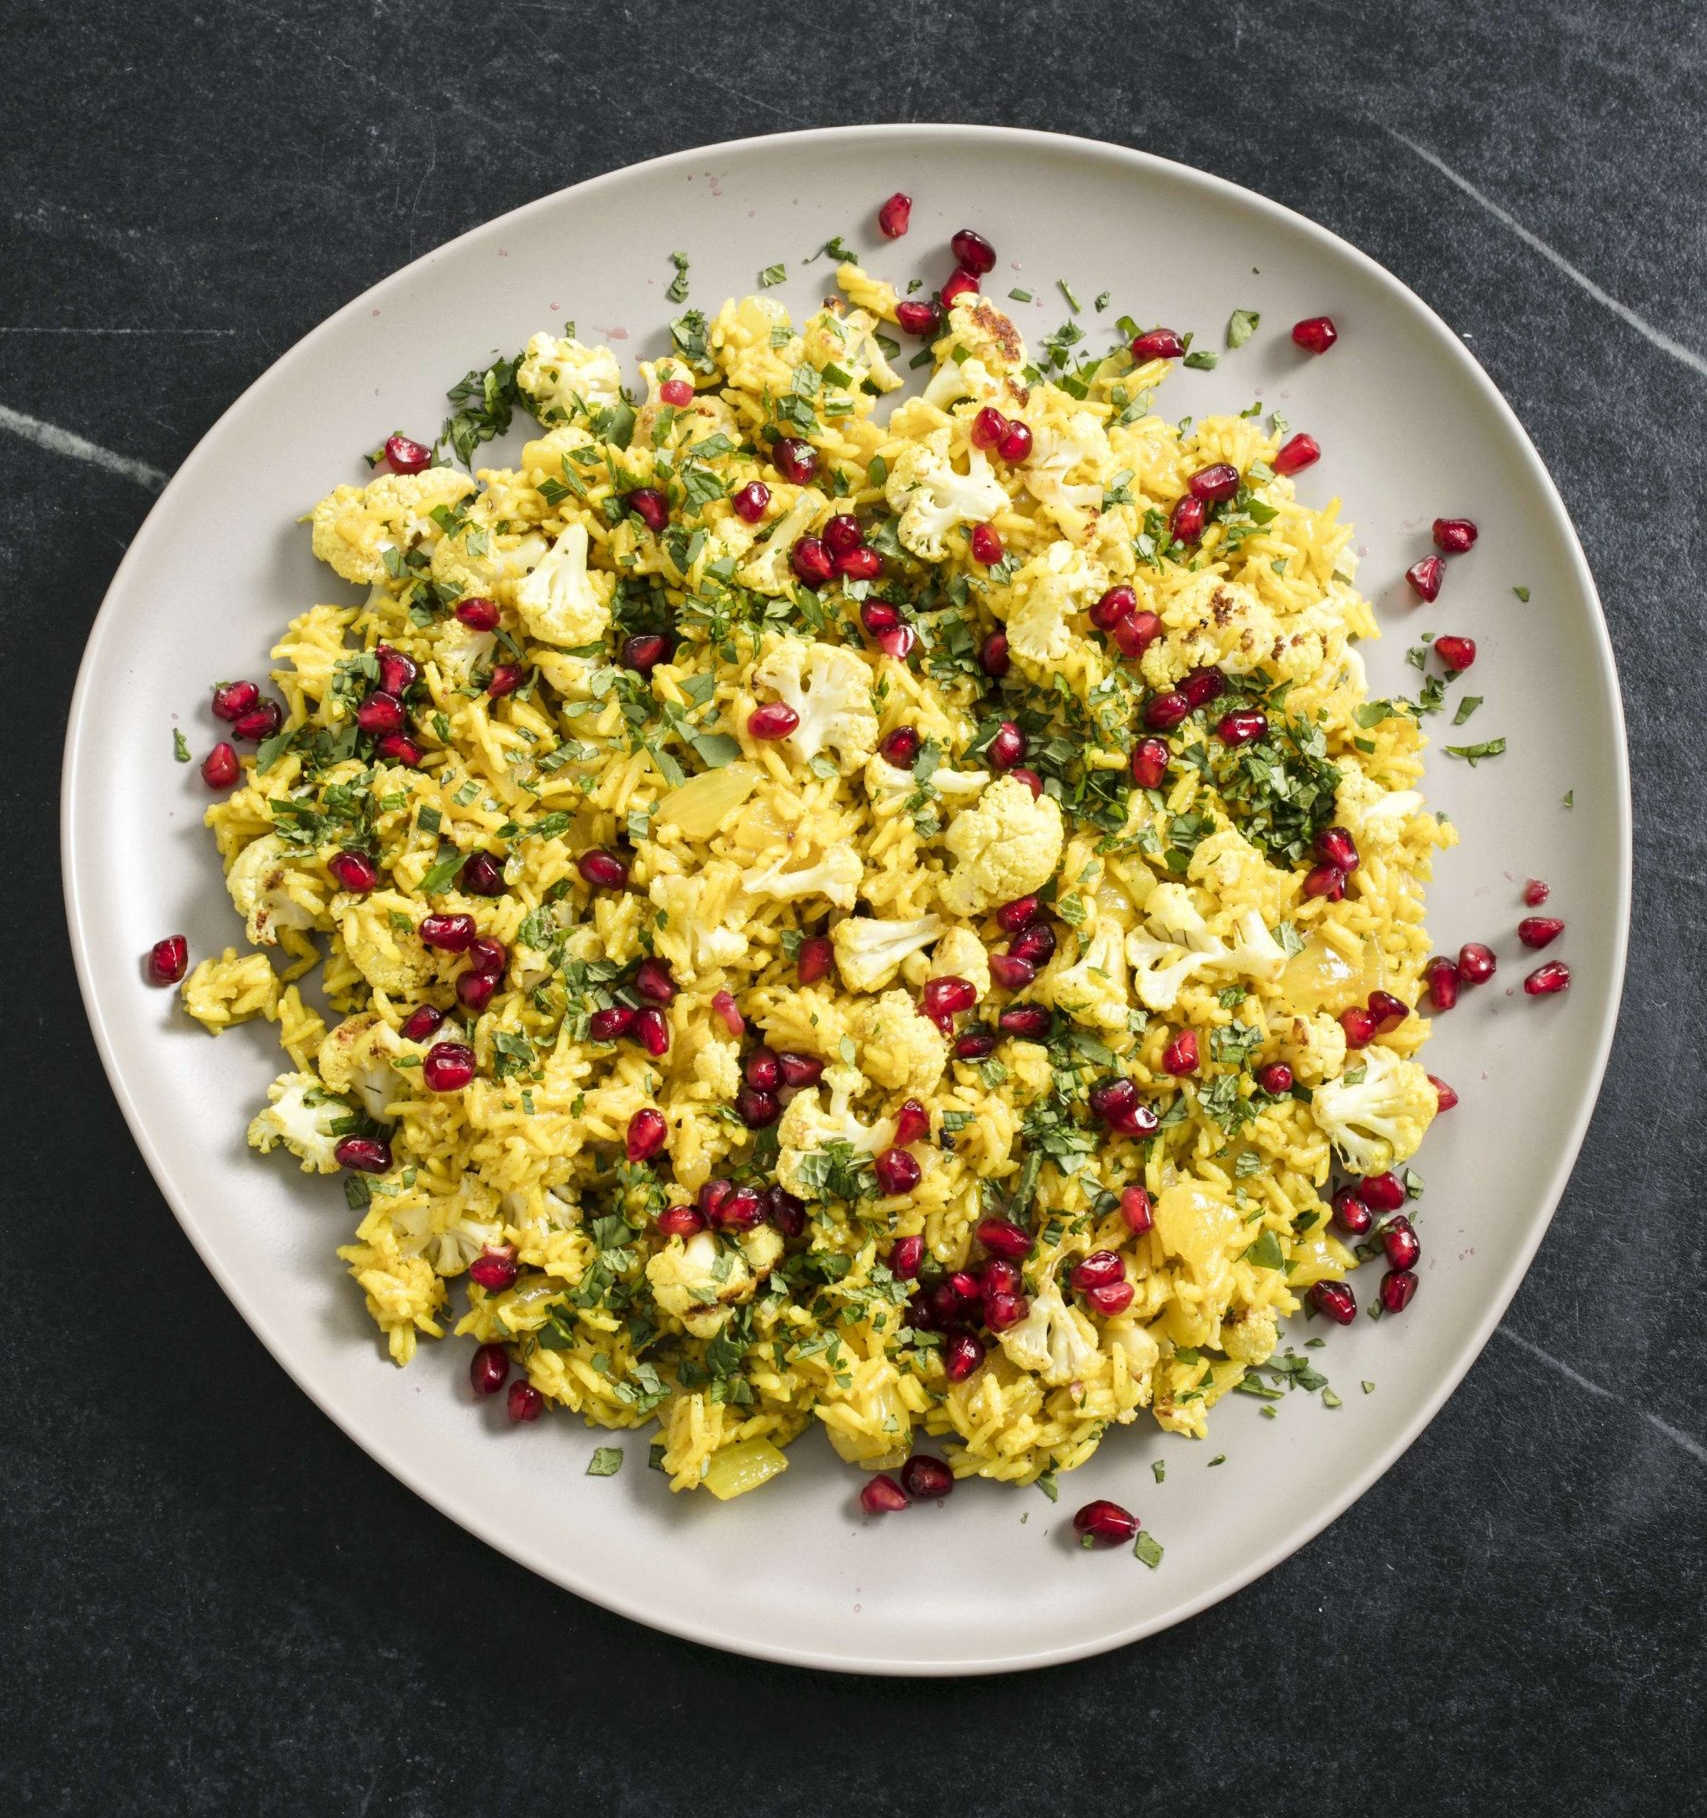 Vegan Spiced Basmati Rice with Cauliflower and Pomegranate